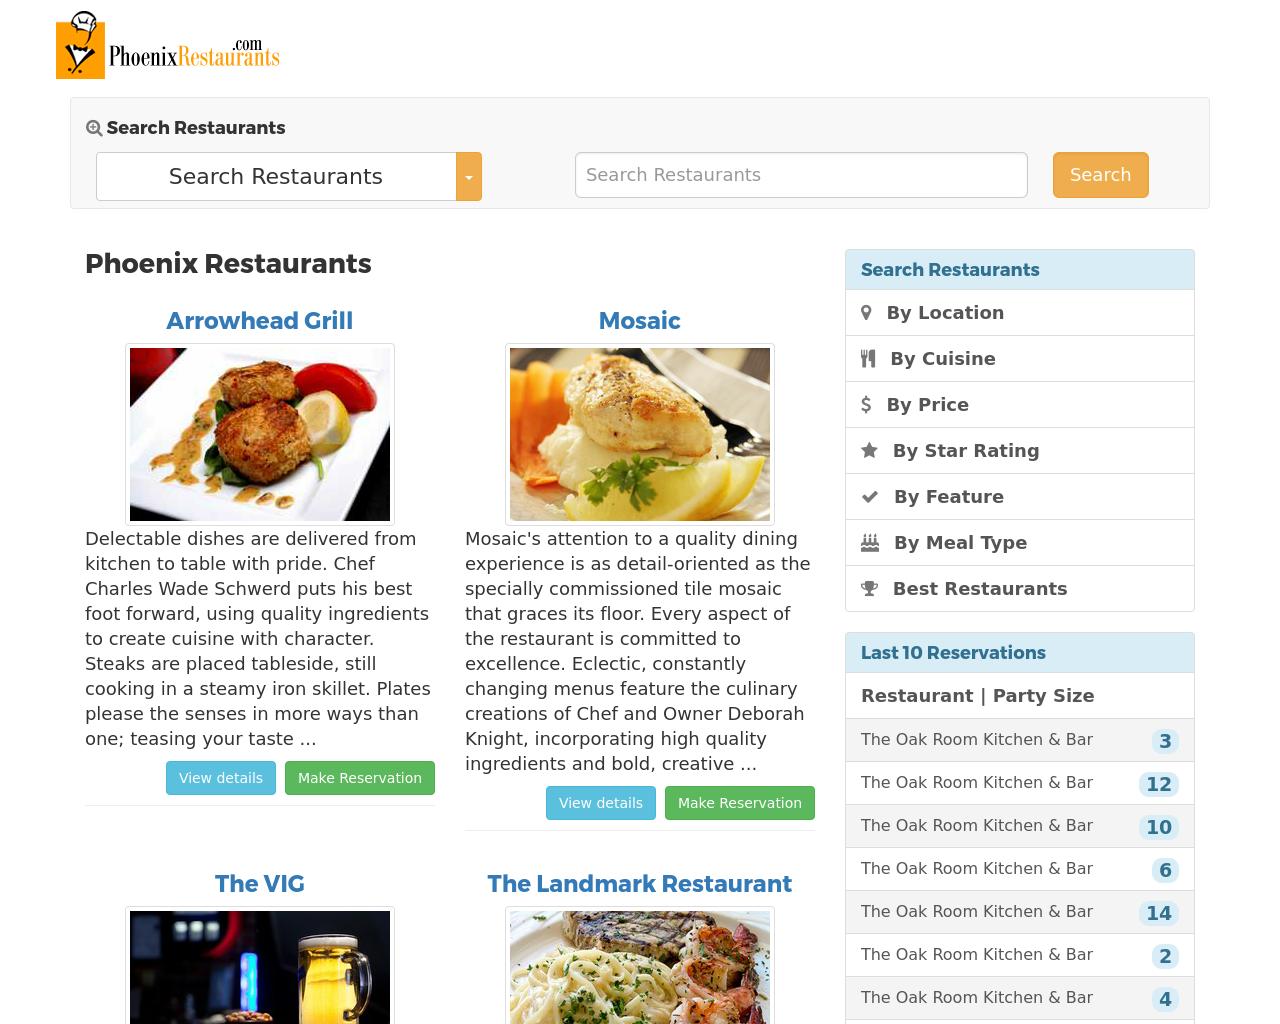 PhoenixRestaurants.com-Advertising-Reviews-Pricing